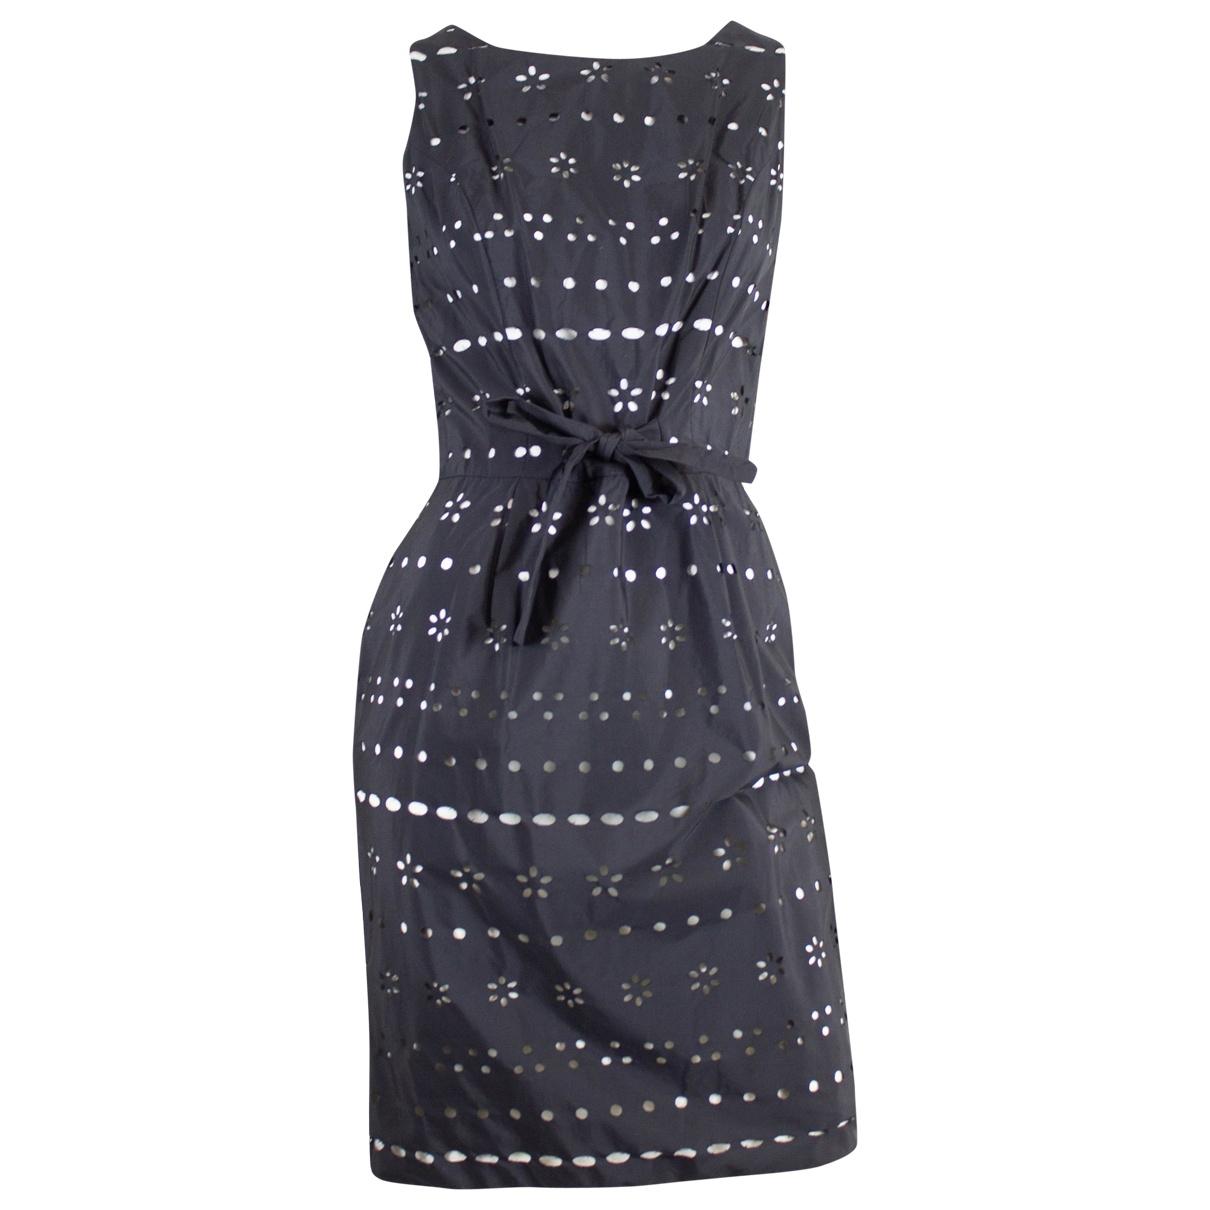 Moschino Cheap And Chic \N Black dress for Women 12 UK